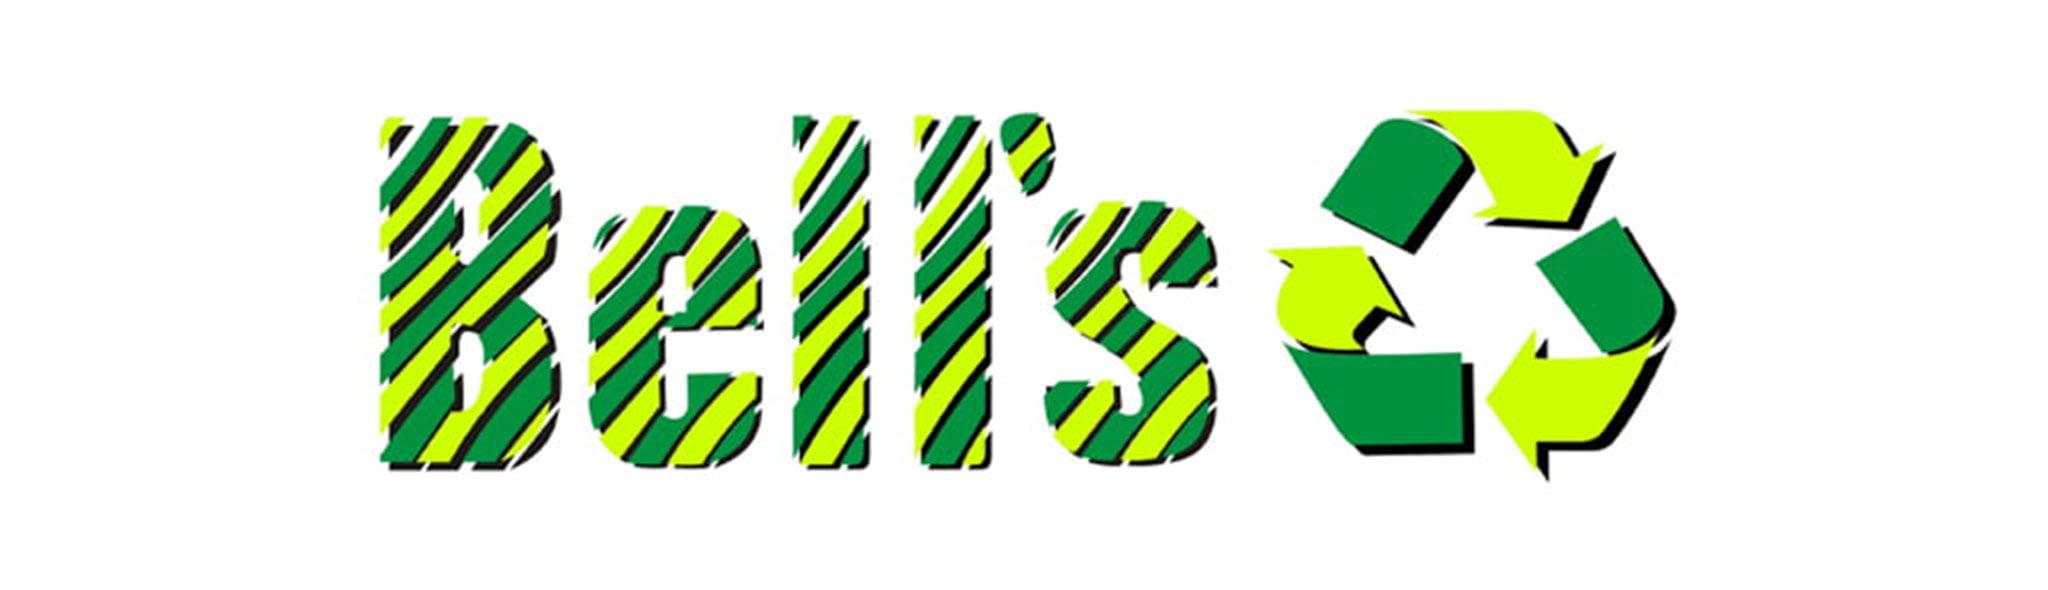 Logotipo de Bell's